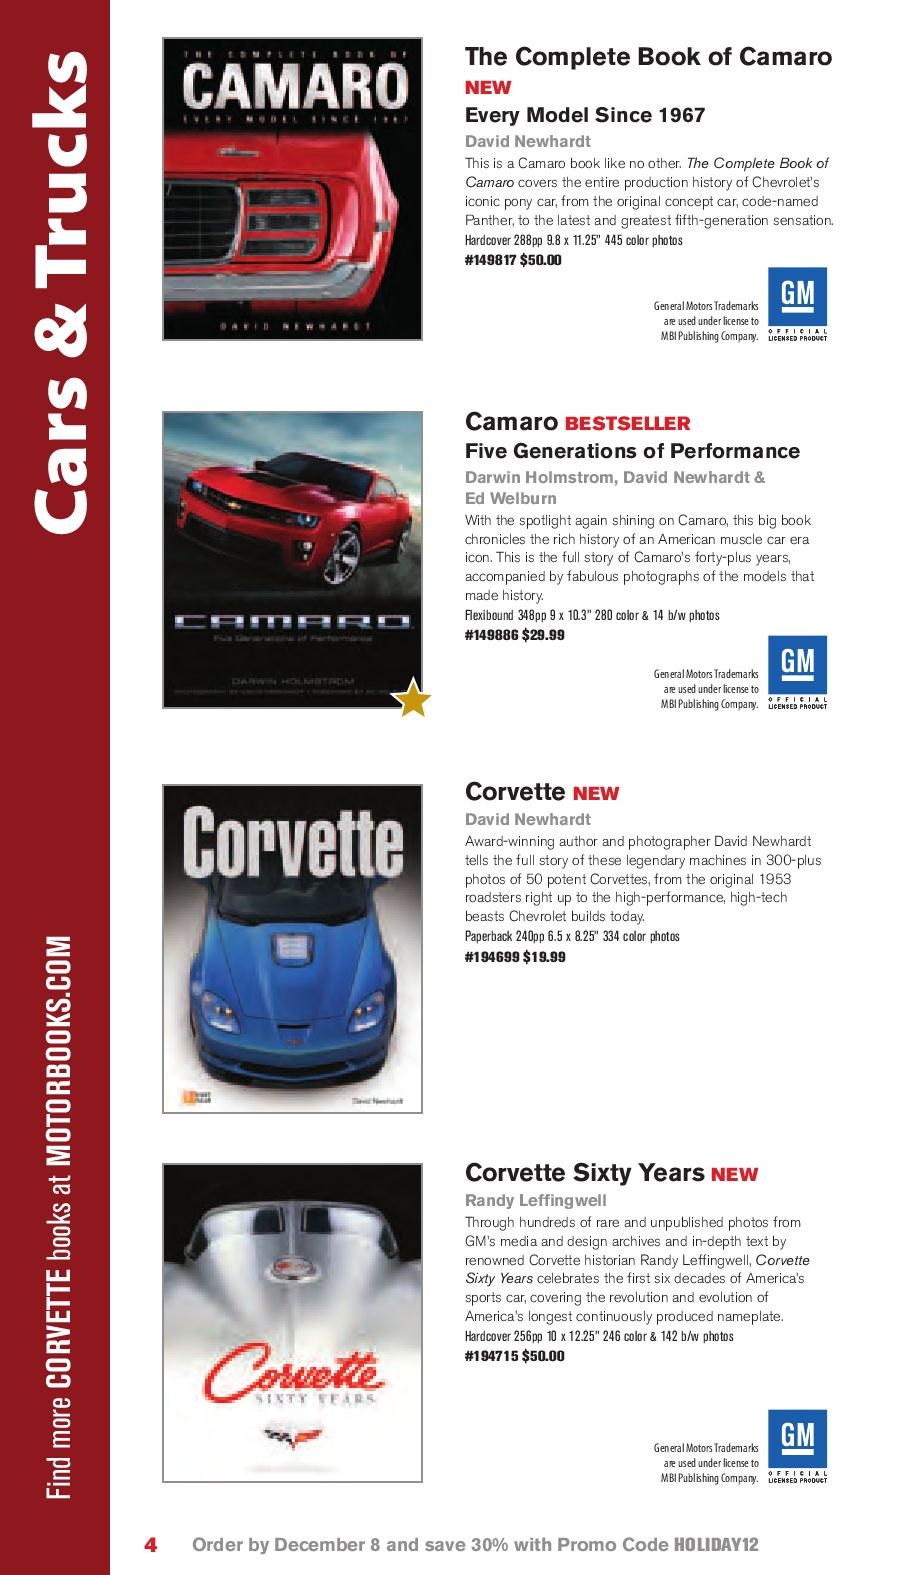 motobooks.com